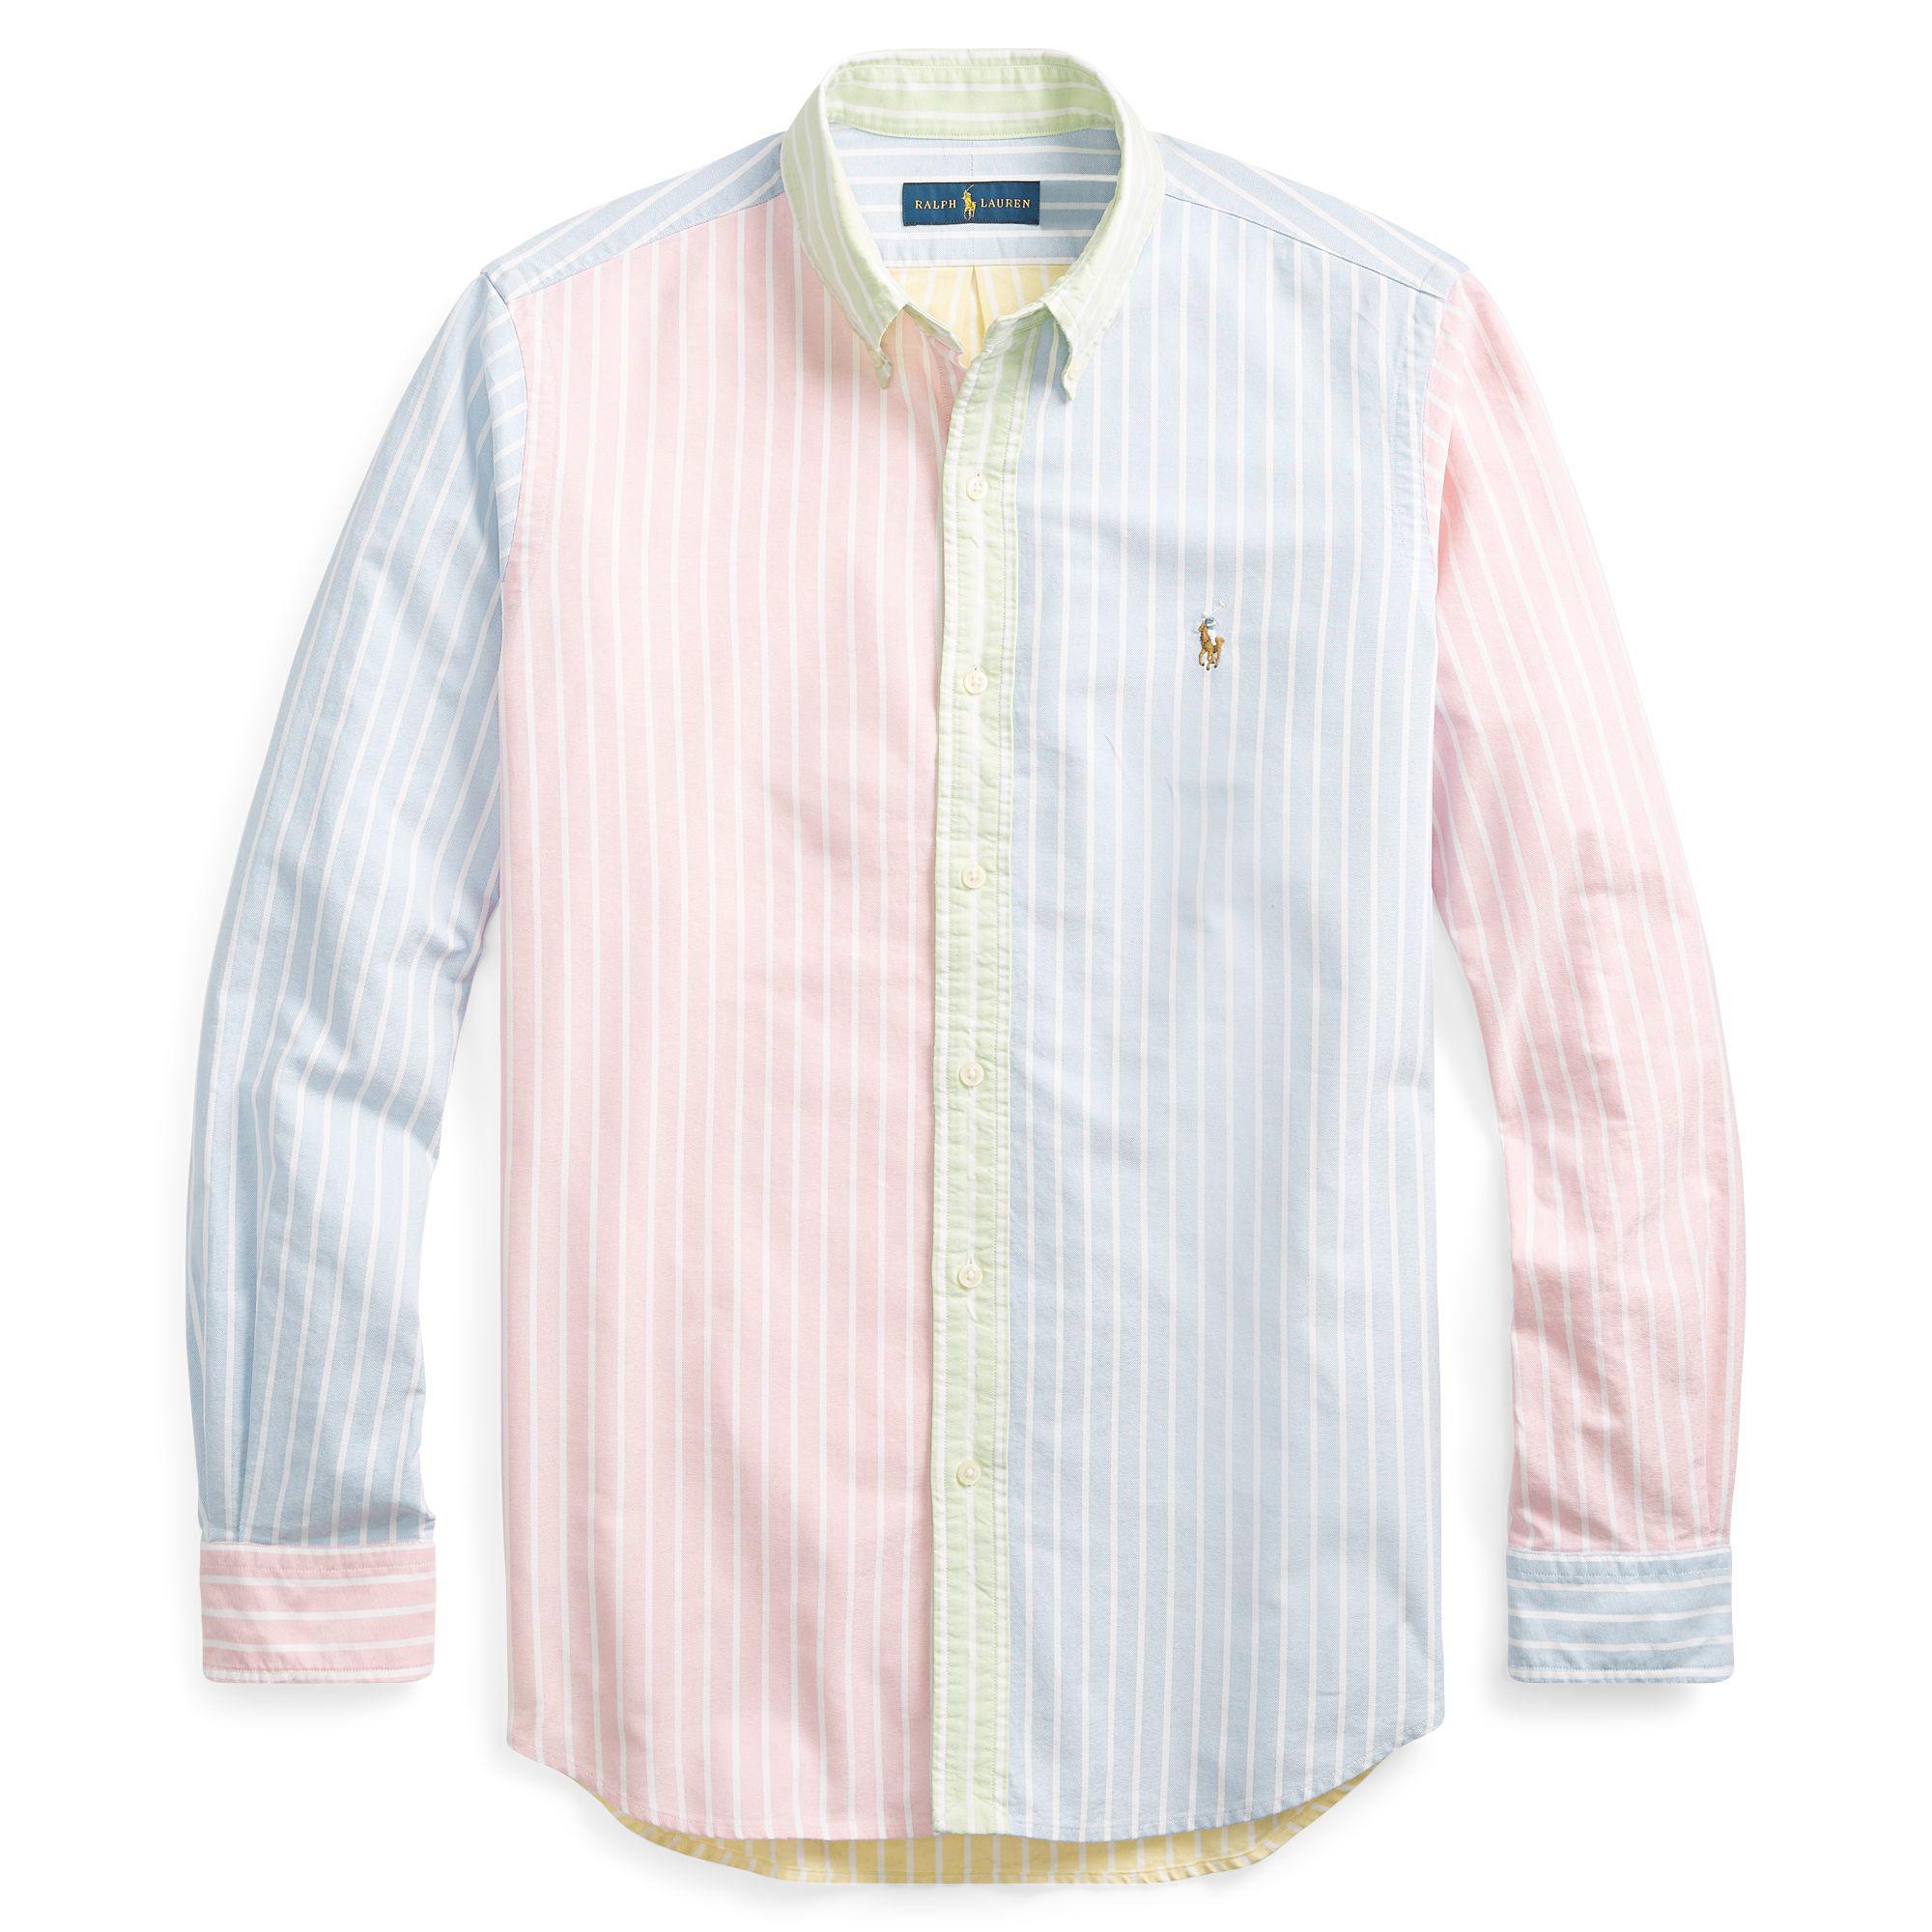 Men For Polo Lyst Shirt Iconic Fun Oxford Ralph Lauren The 5lJcTF1uK3